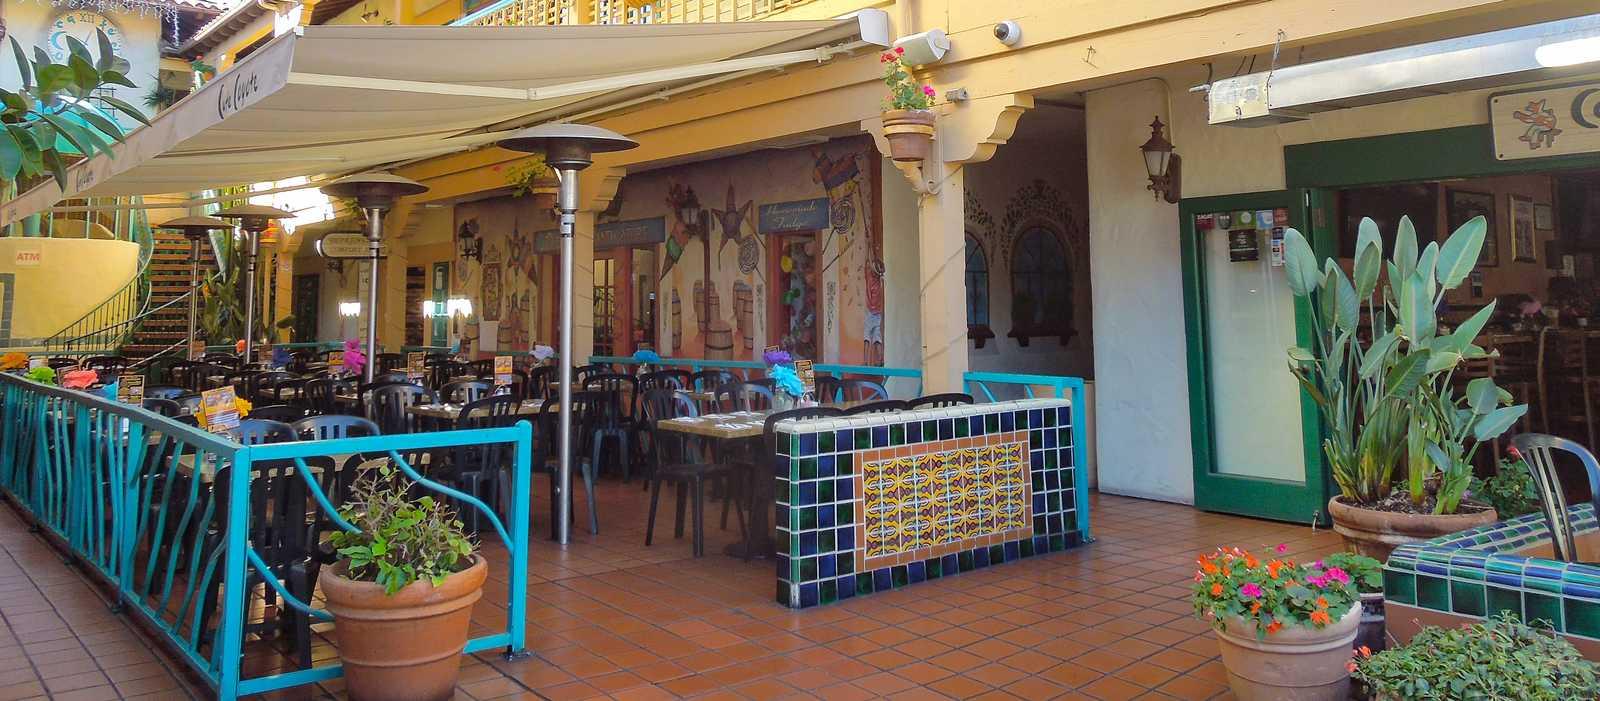 Café Coyote San Diego